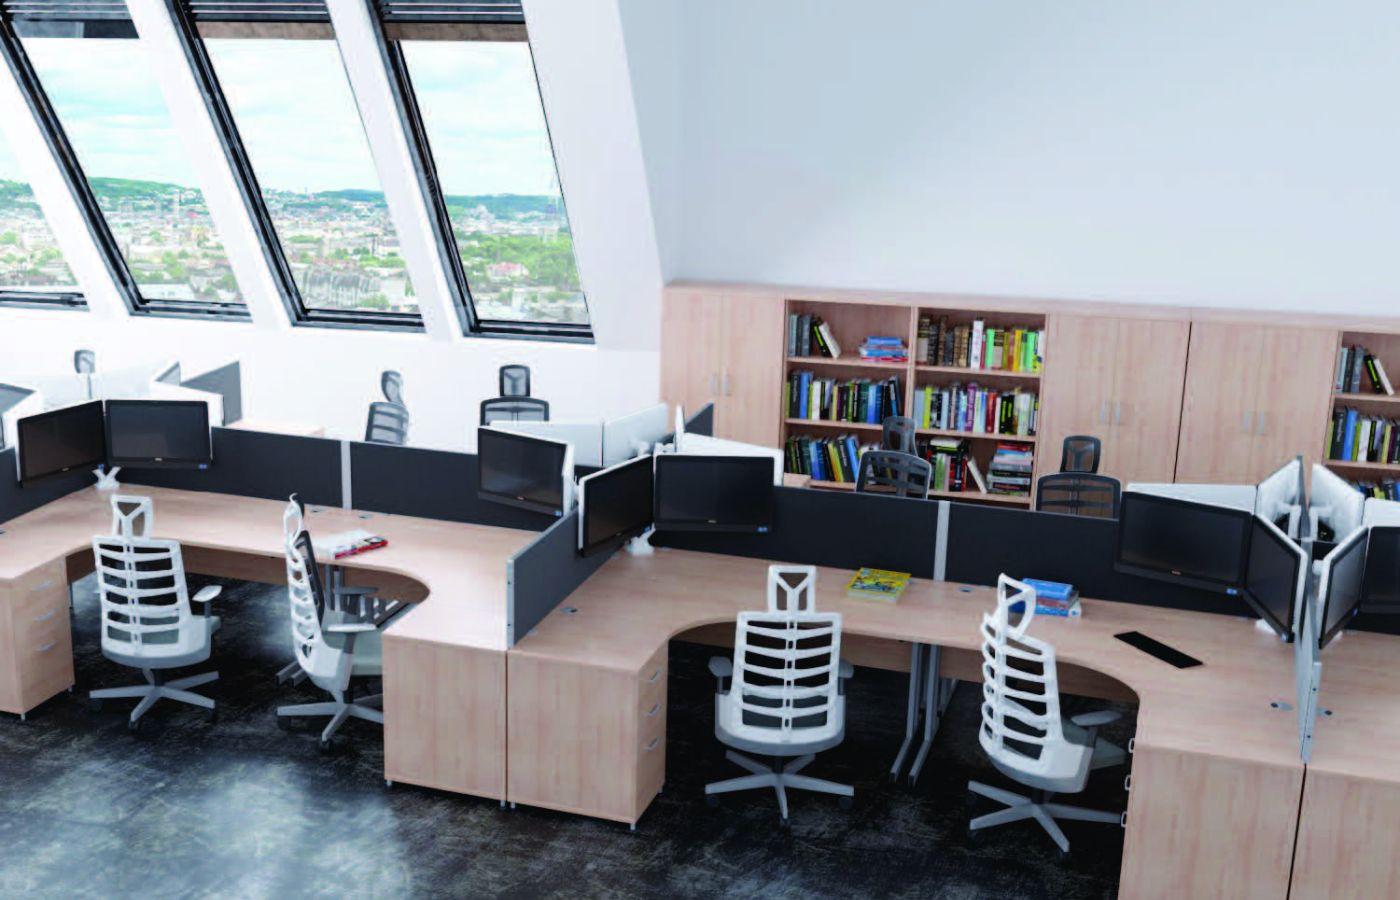 wooden seating area multiple desks